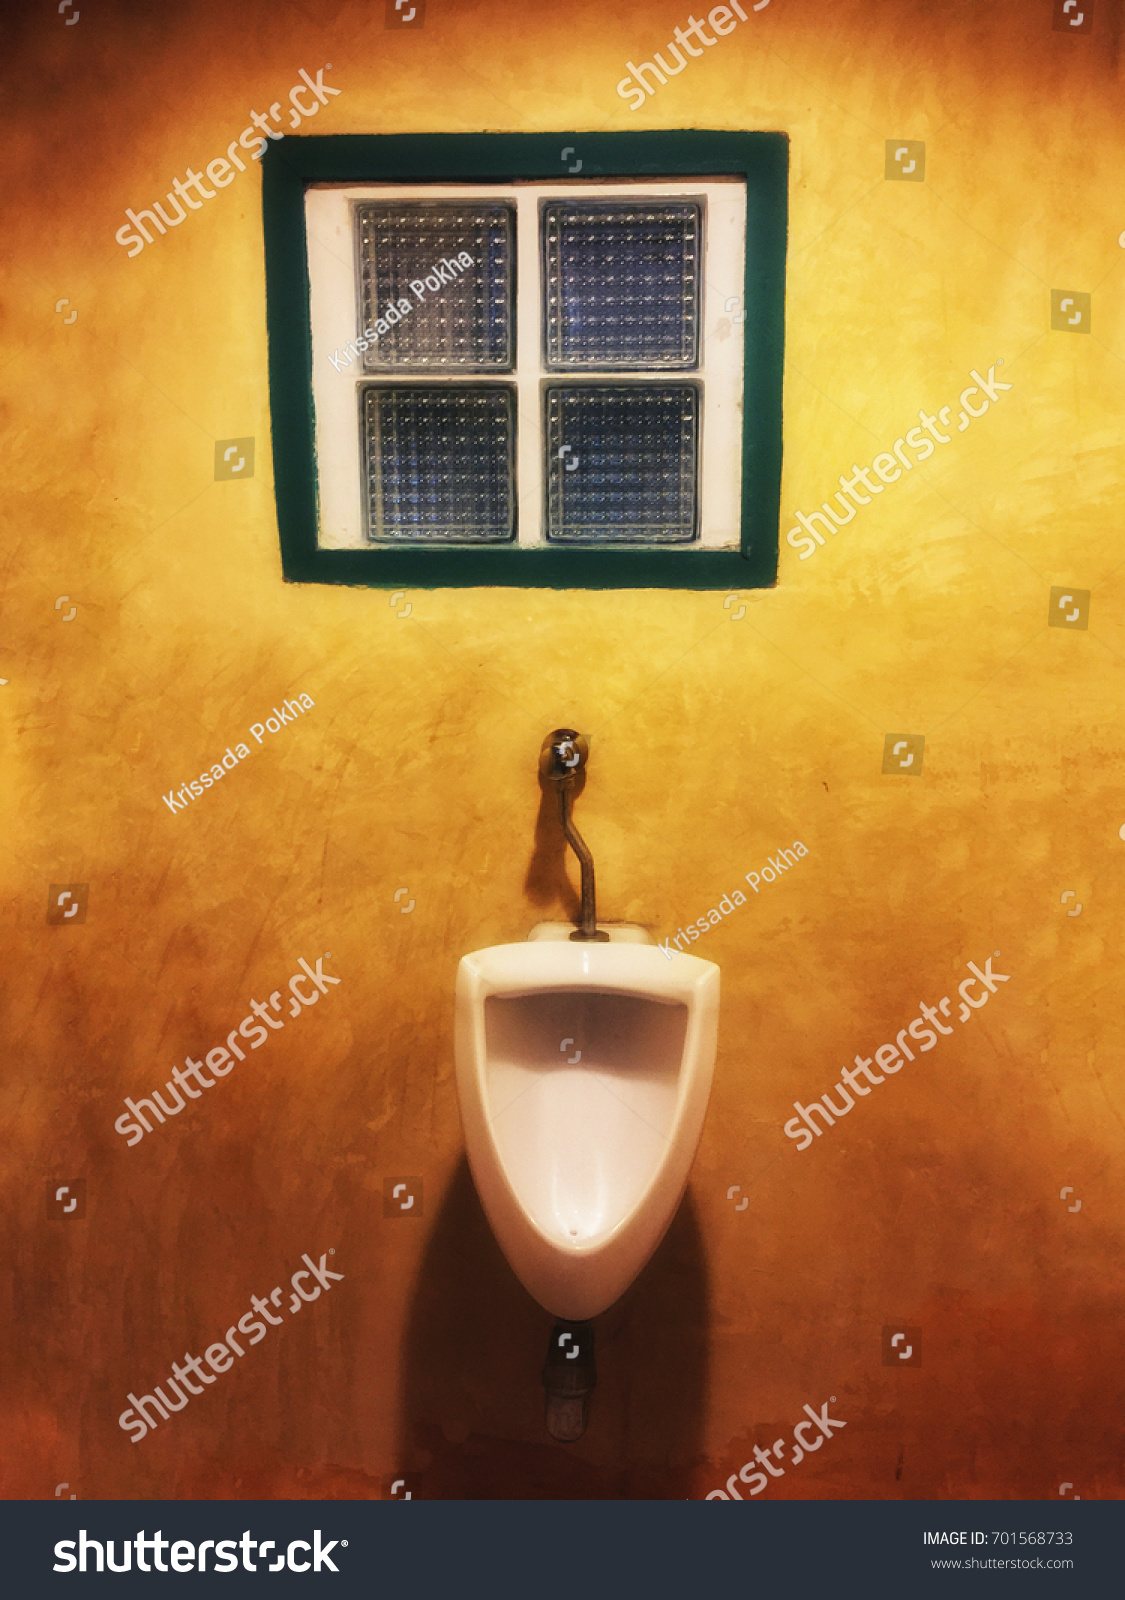 Urinals Chamber Pot Men On Orange Stock Photo (Edit Now) 701568733 ...